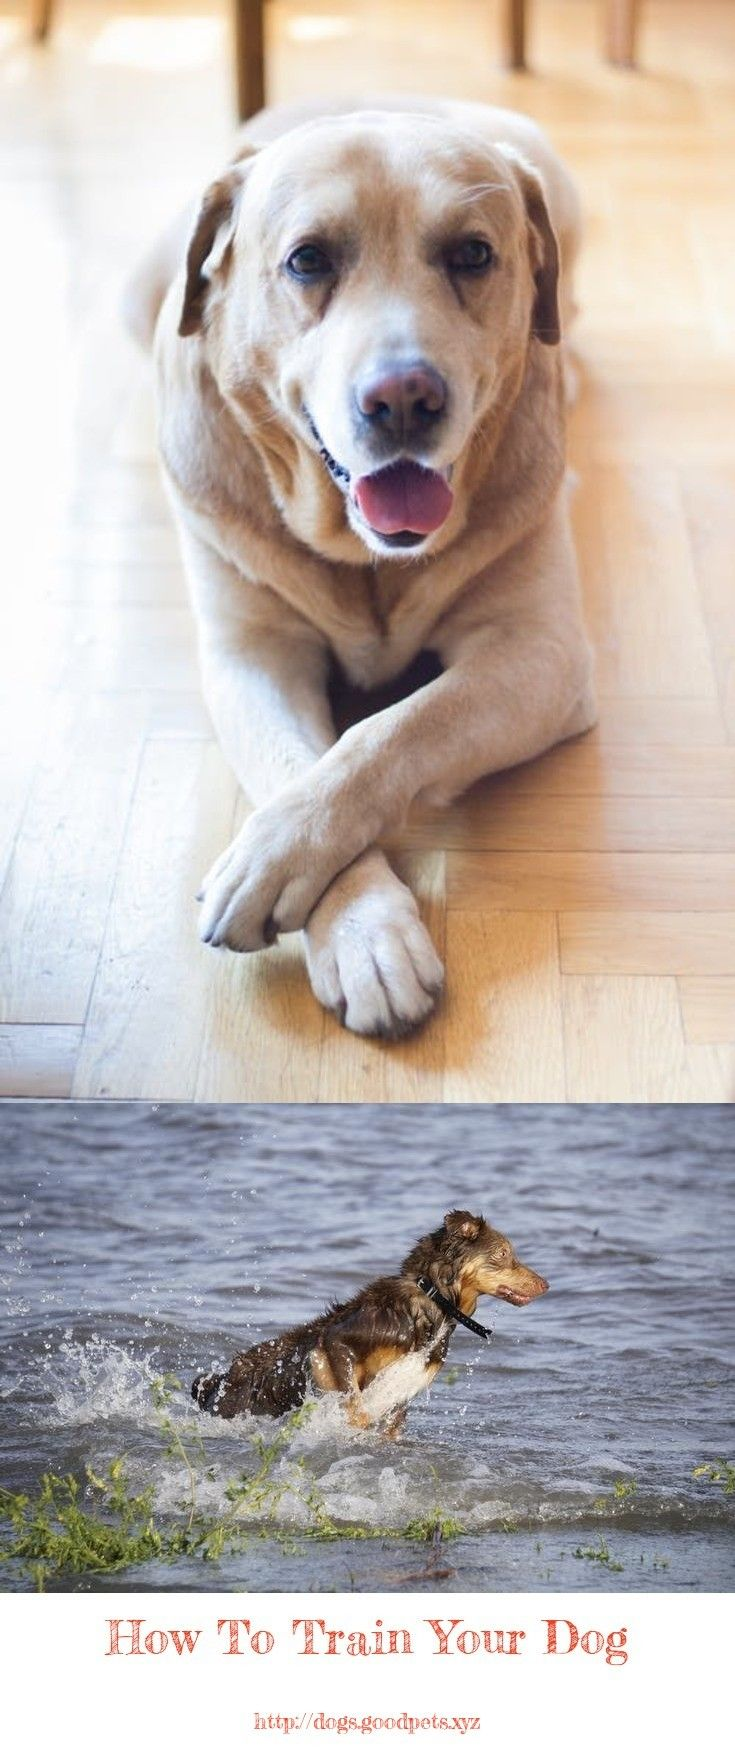 Dog Training Tips In Hindi Dogtrainingtips Dogs Your Dog